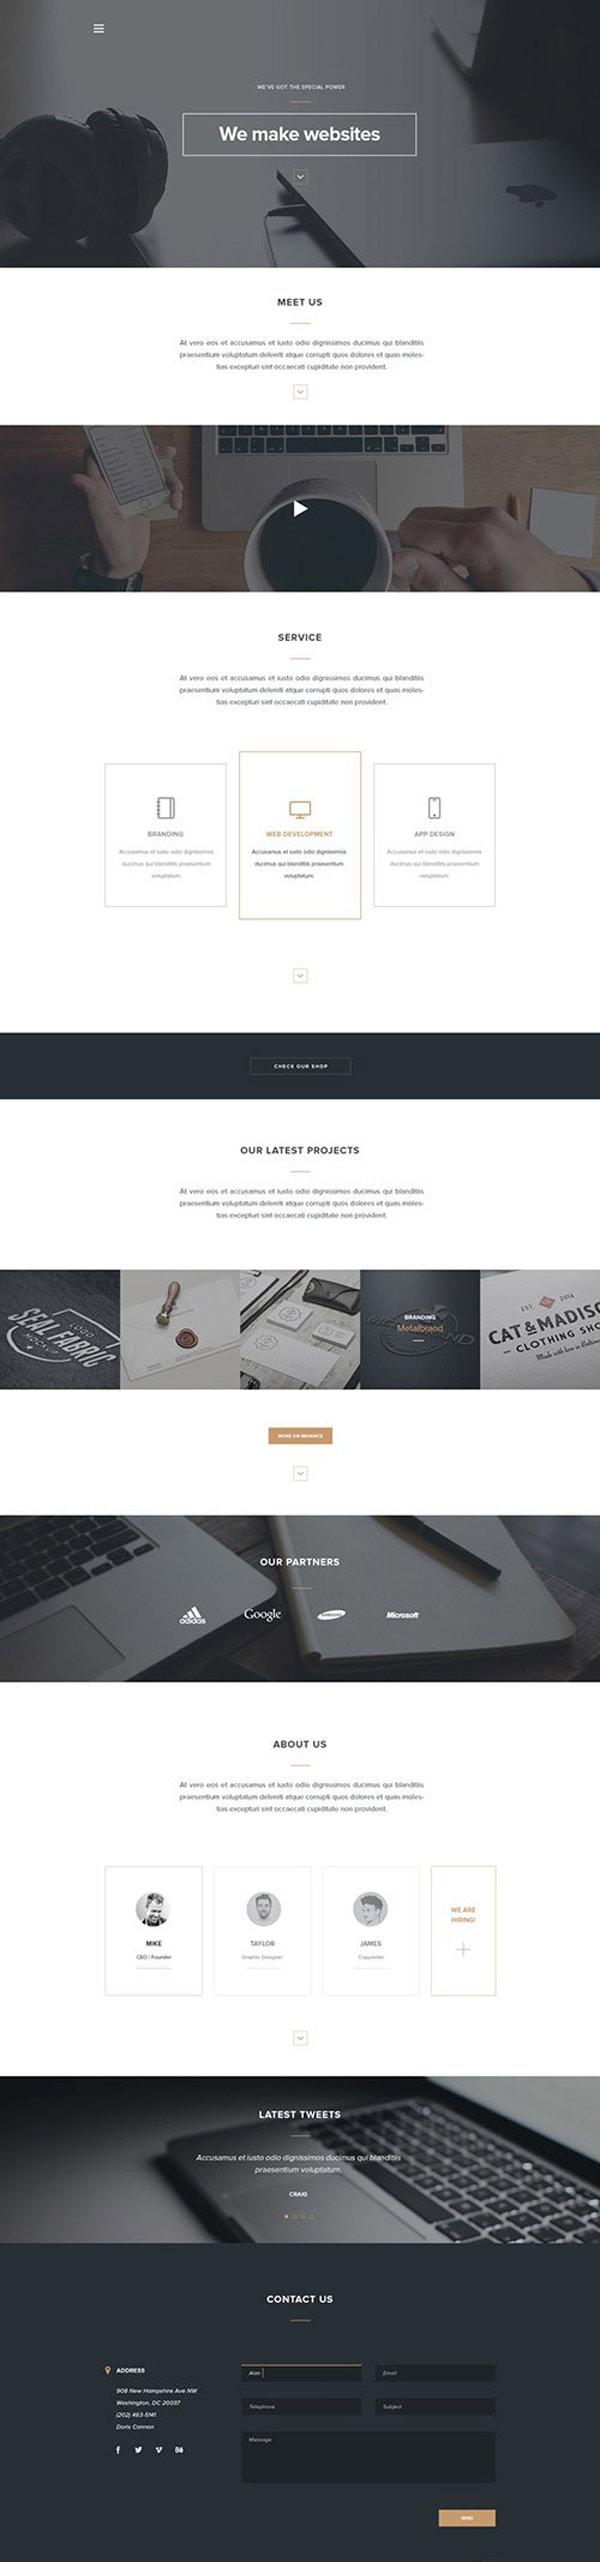 Arcadia-free-PSD-landing-page | Web design | Pinterest | Template ...